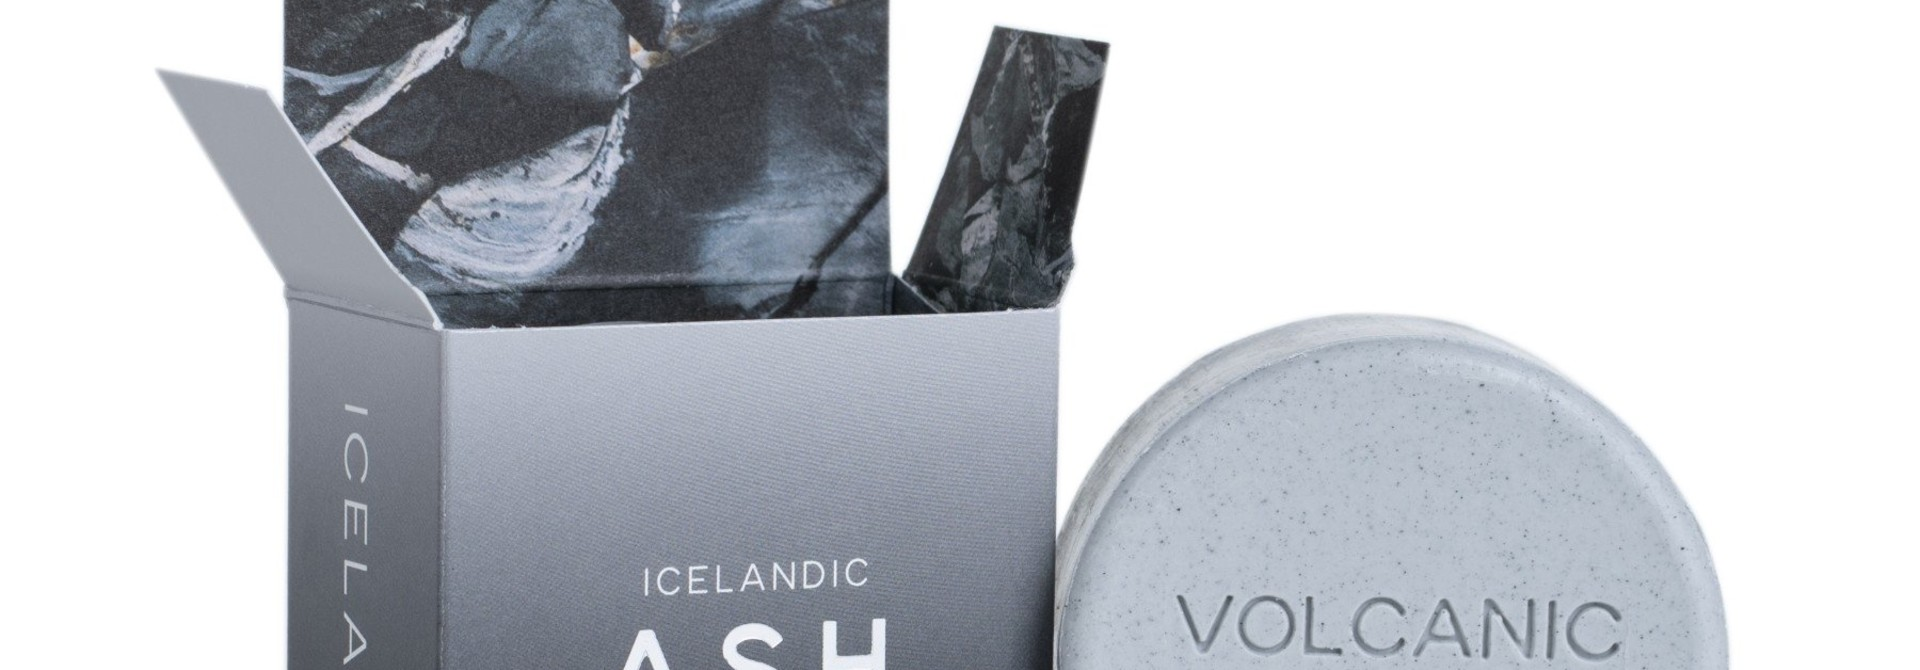 HALLÓ SÁPA - Volcanic Ash